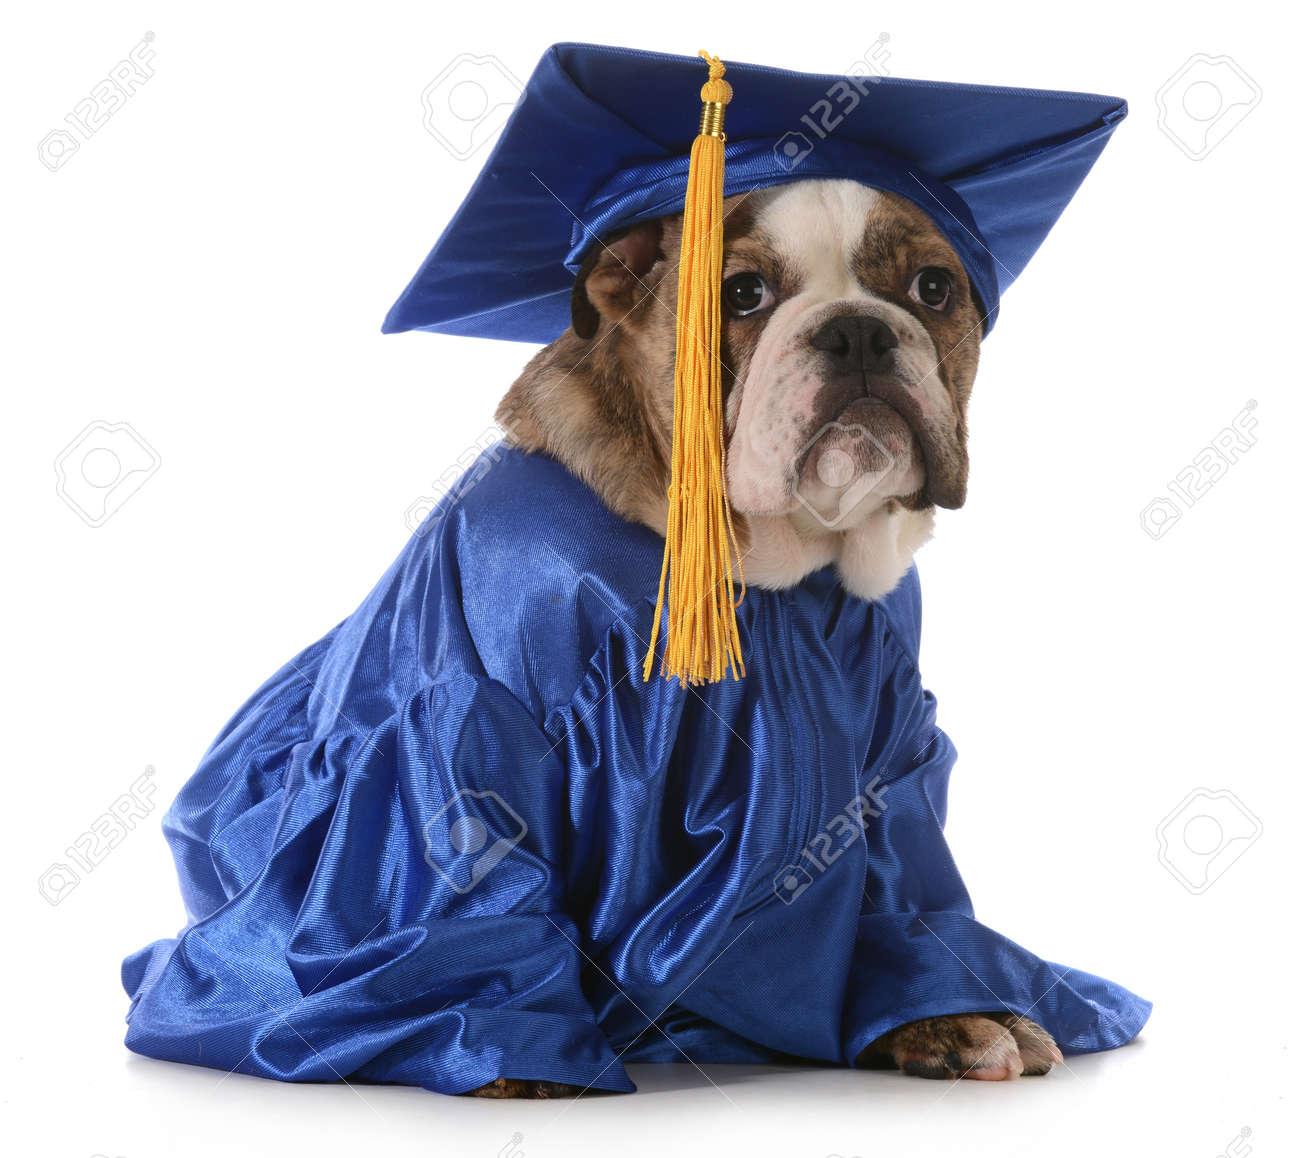 Puppy School English Bulldog Wearing Graduation Hat And Gown